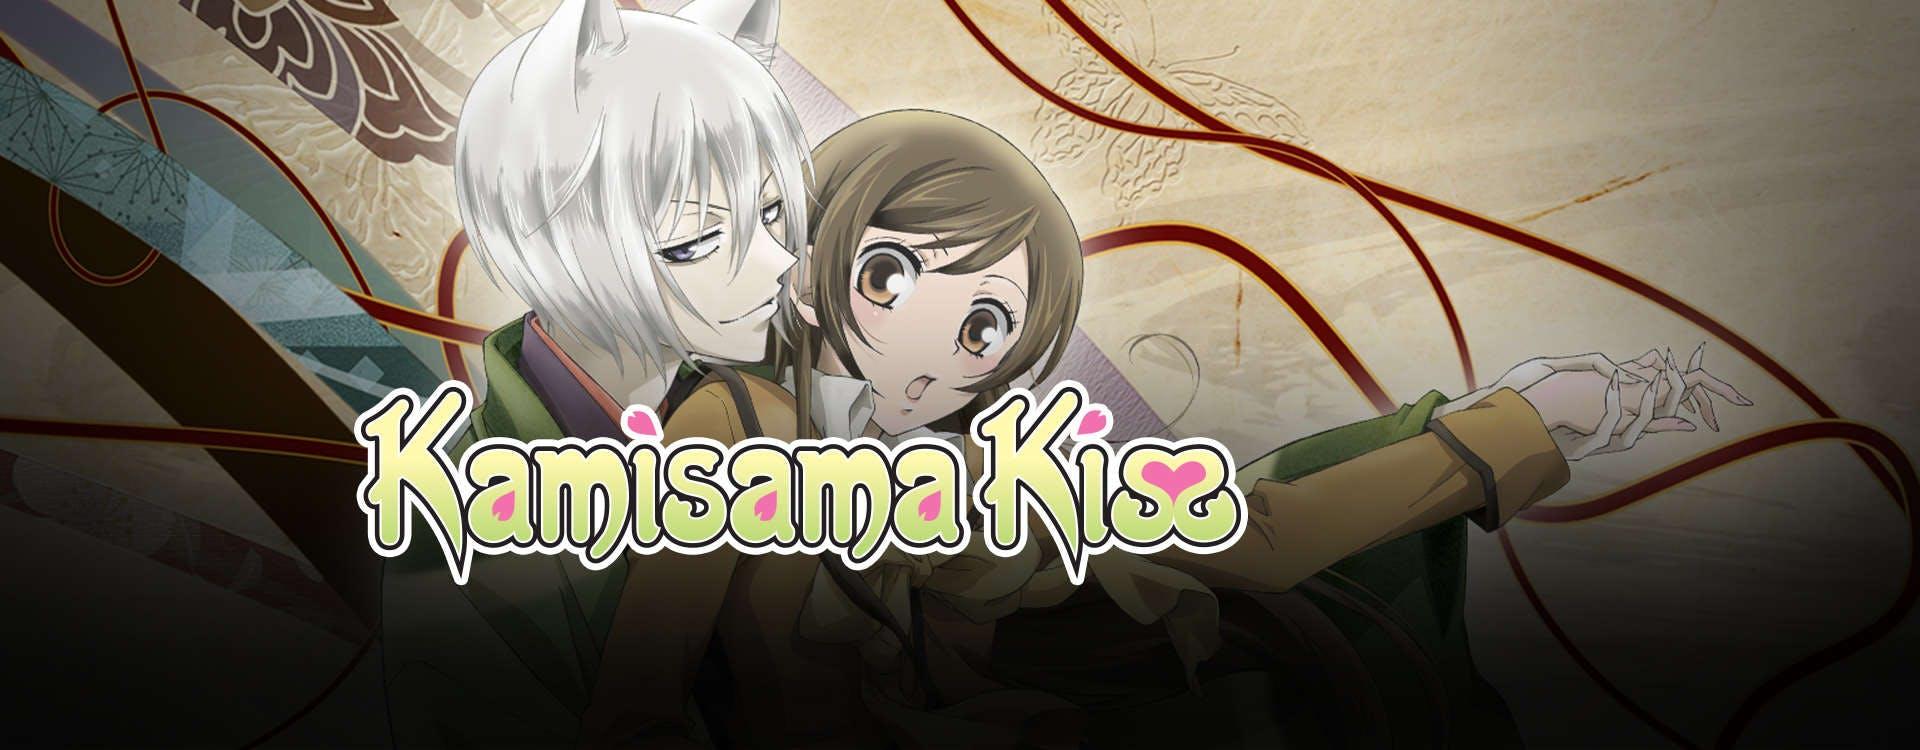 best romance anime : Kamisama Kiss